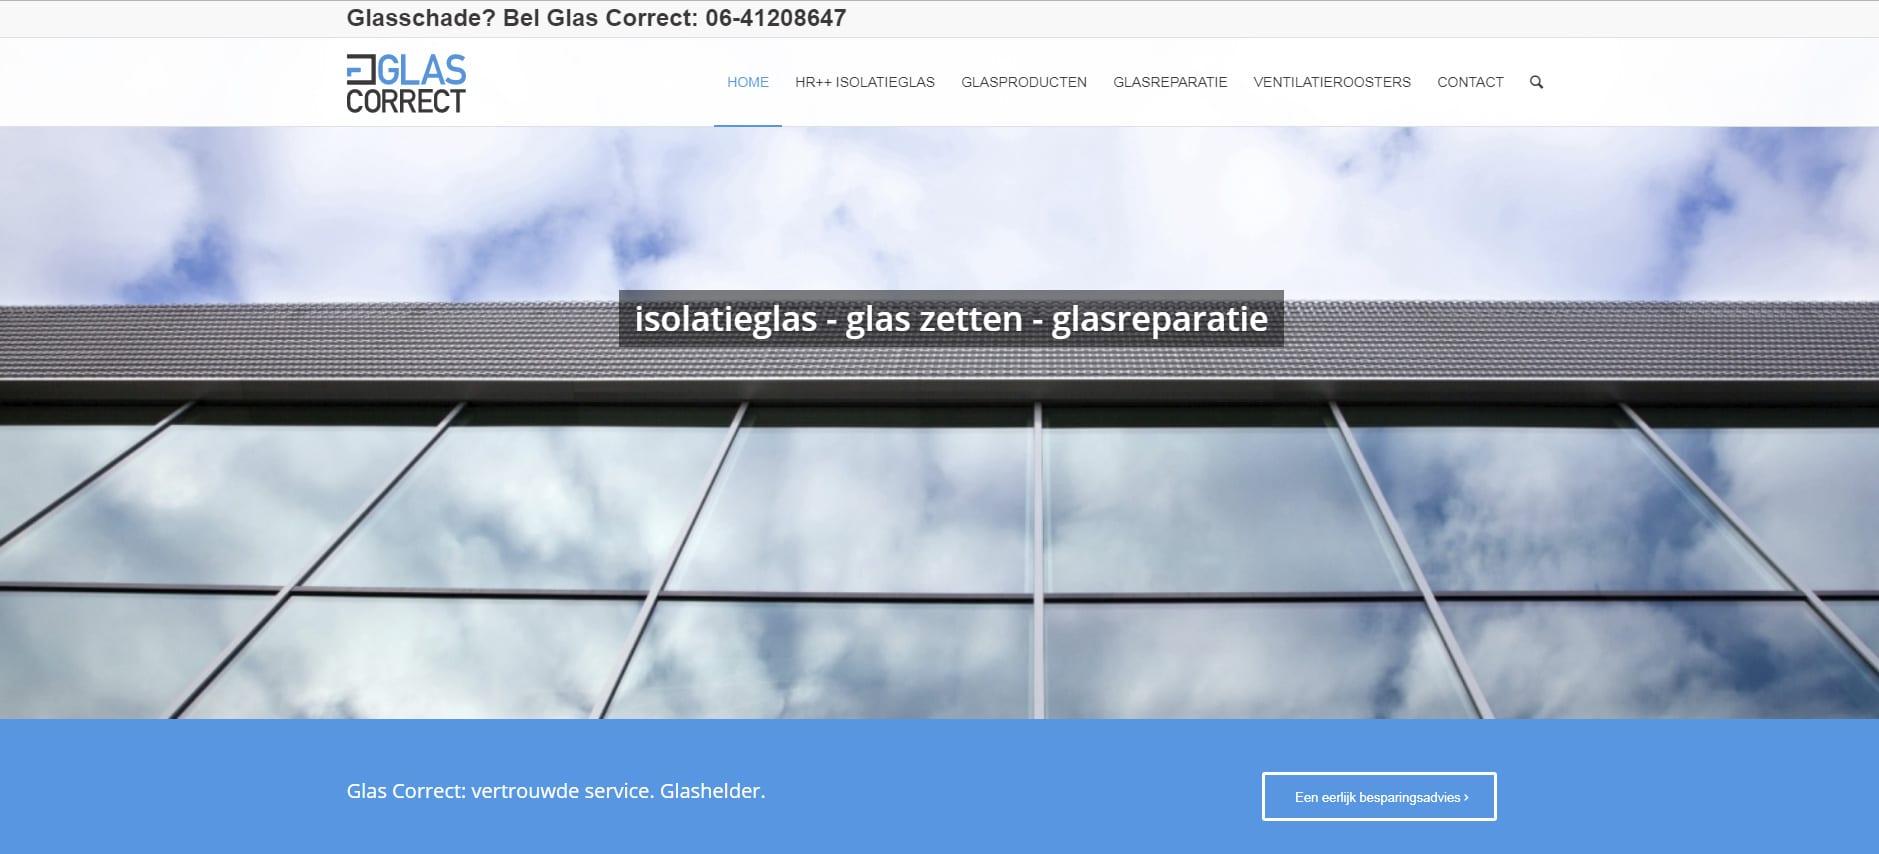 WordPress - Glascorrect - Glascorrect